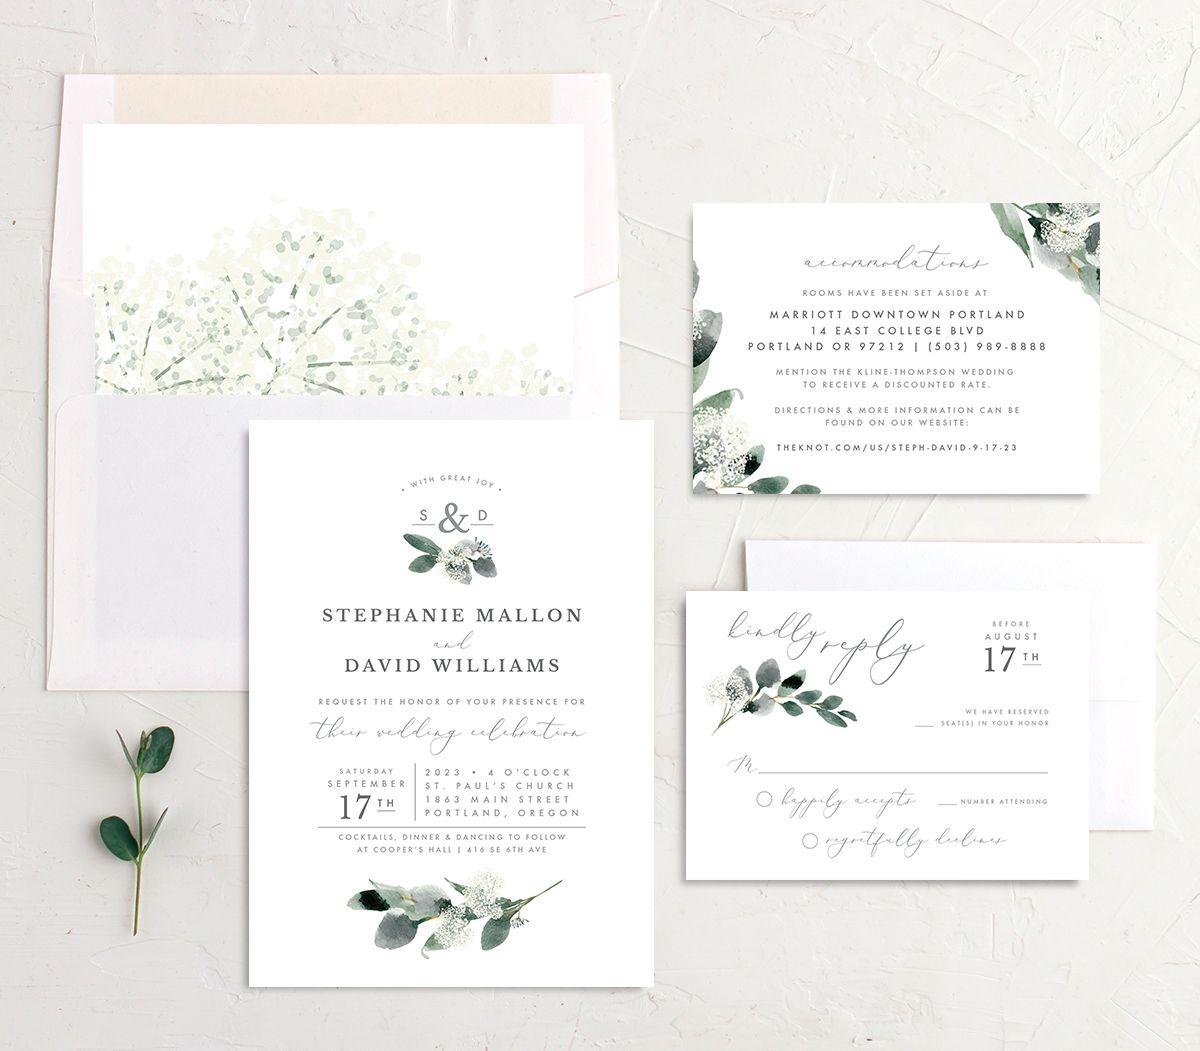 Elegant Greenery Wedding Invitation suite in white